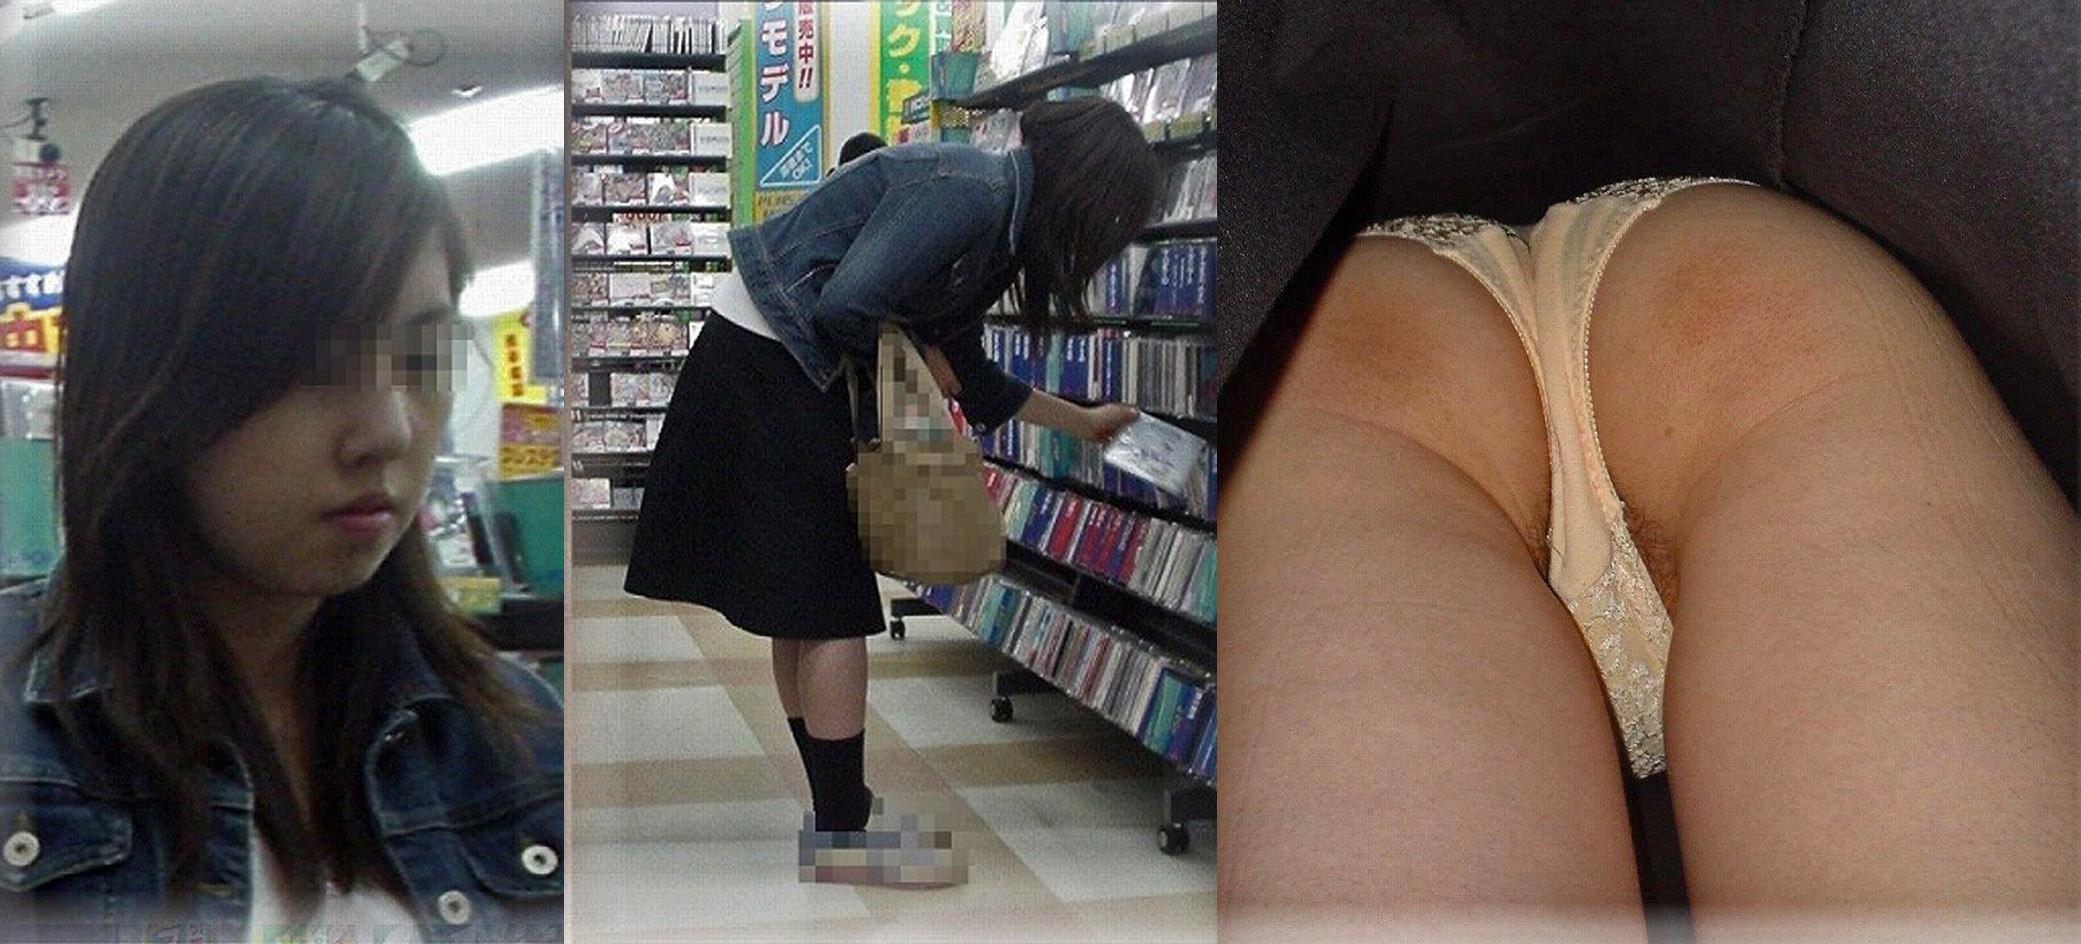 DVD CD レンタル屋 パンツ 無防備 パンチラ エロ画像【19】